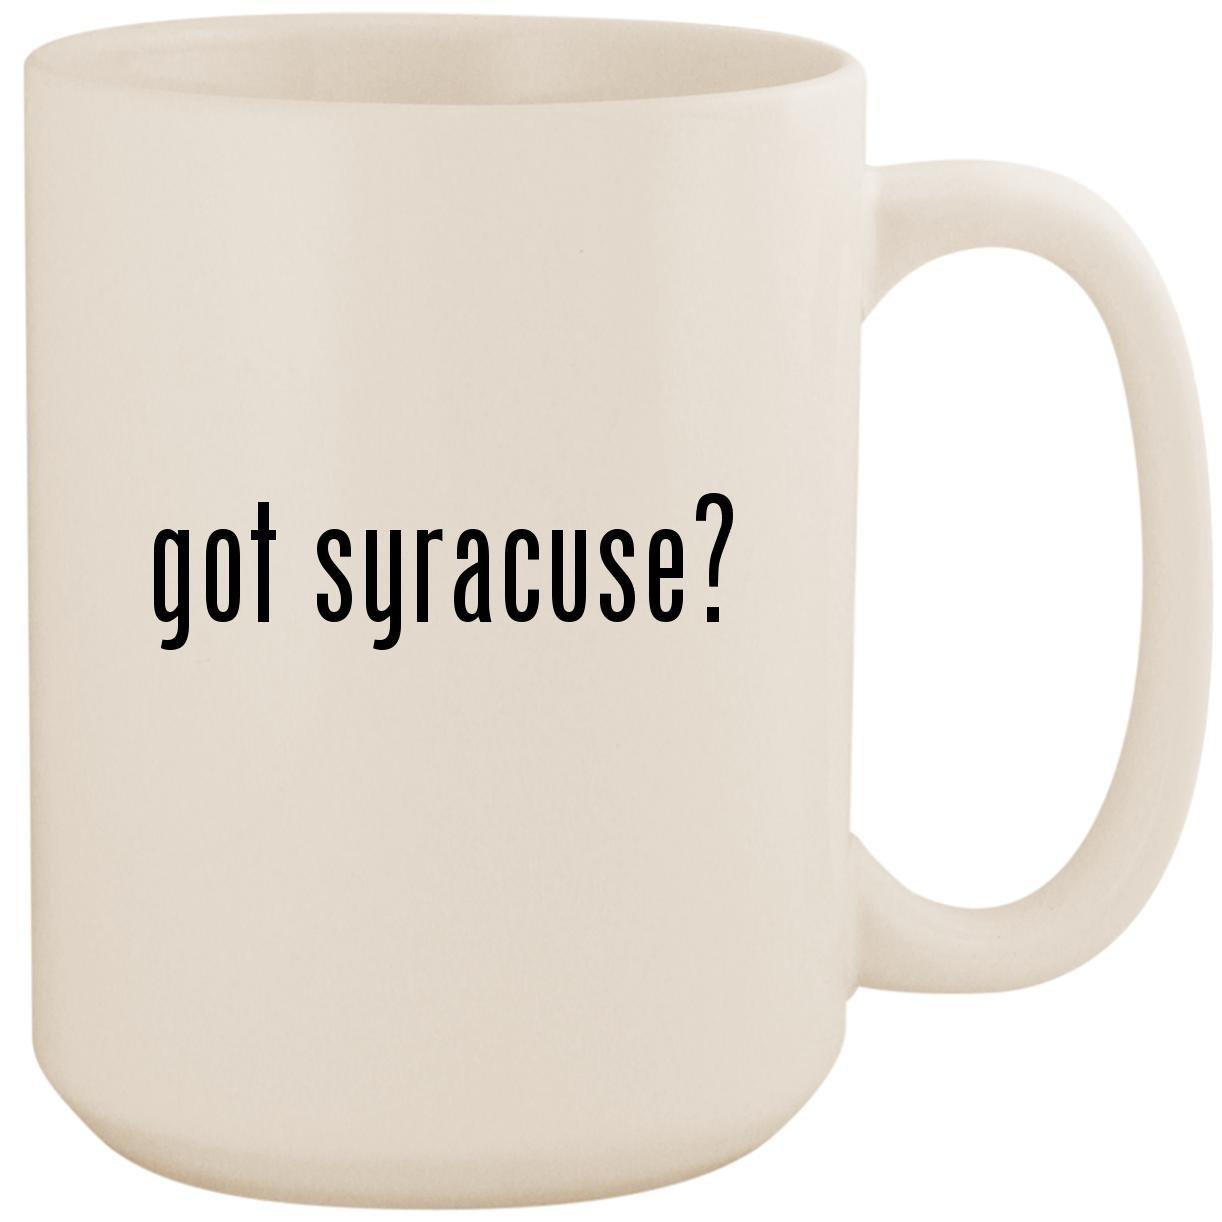 got syracuse? - White 15oz Ceramic Coffee Mug Cup